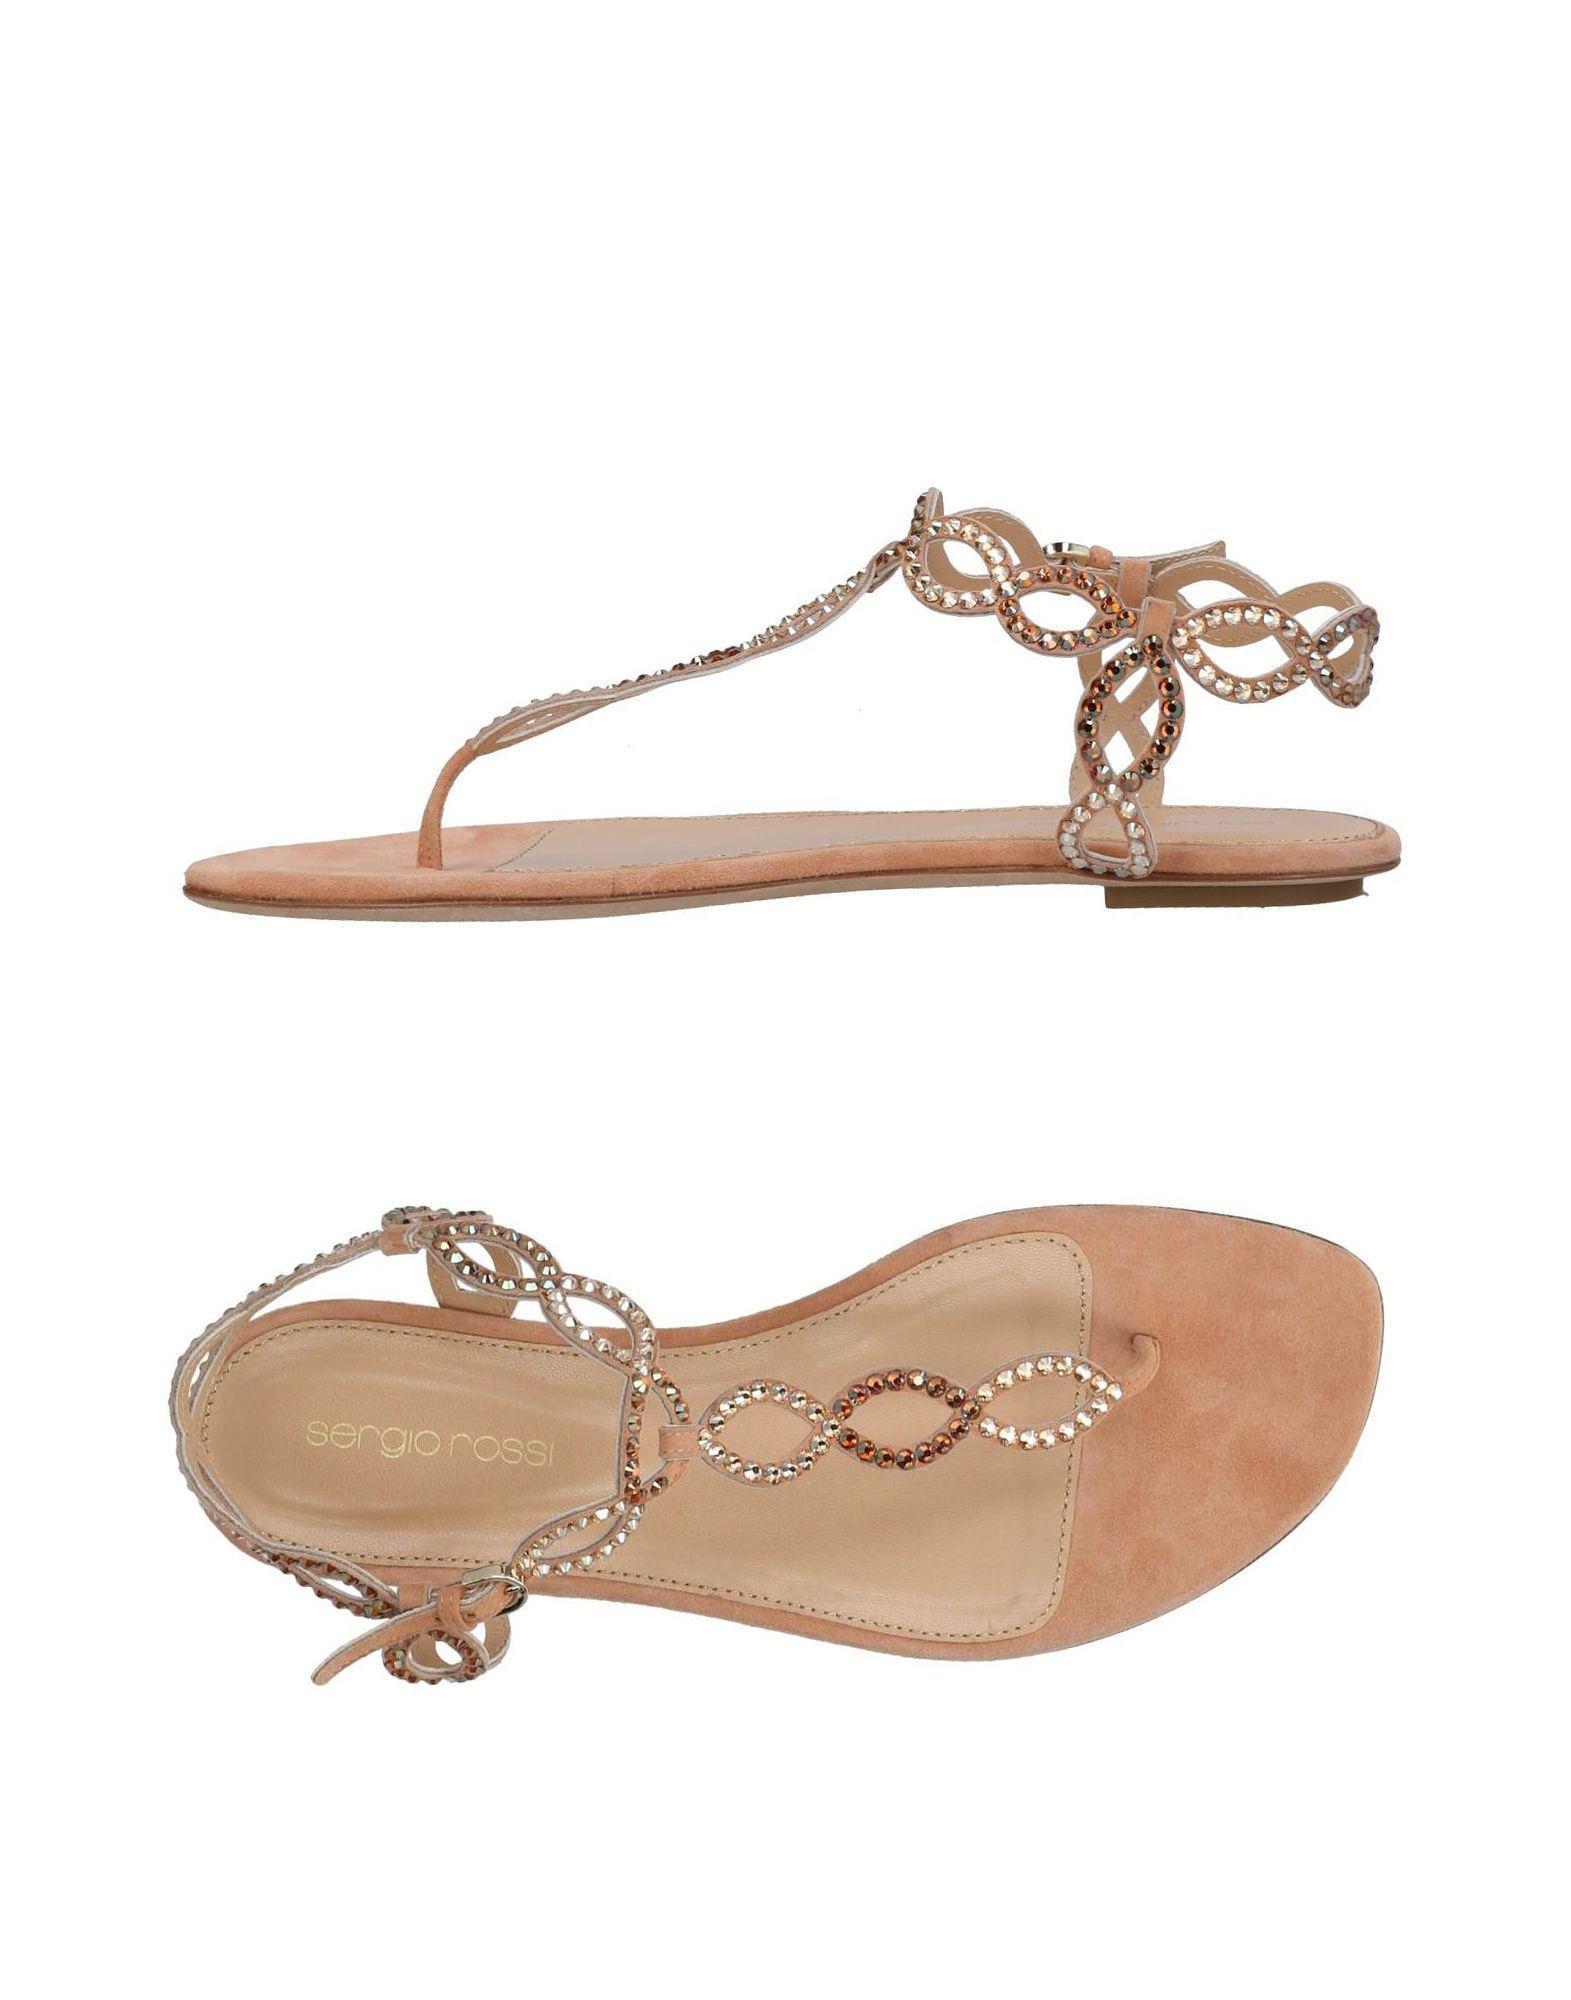 FOOTWEAR - Toe post sandals Sergio Rossi yJBvZfG